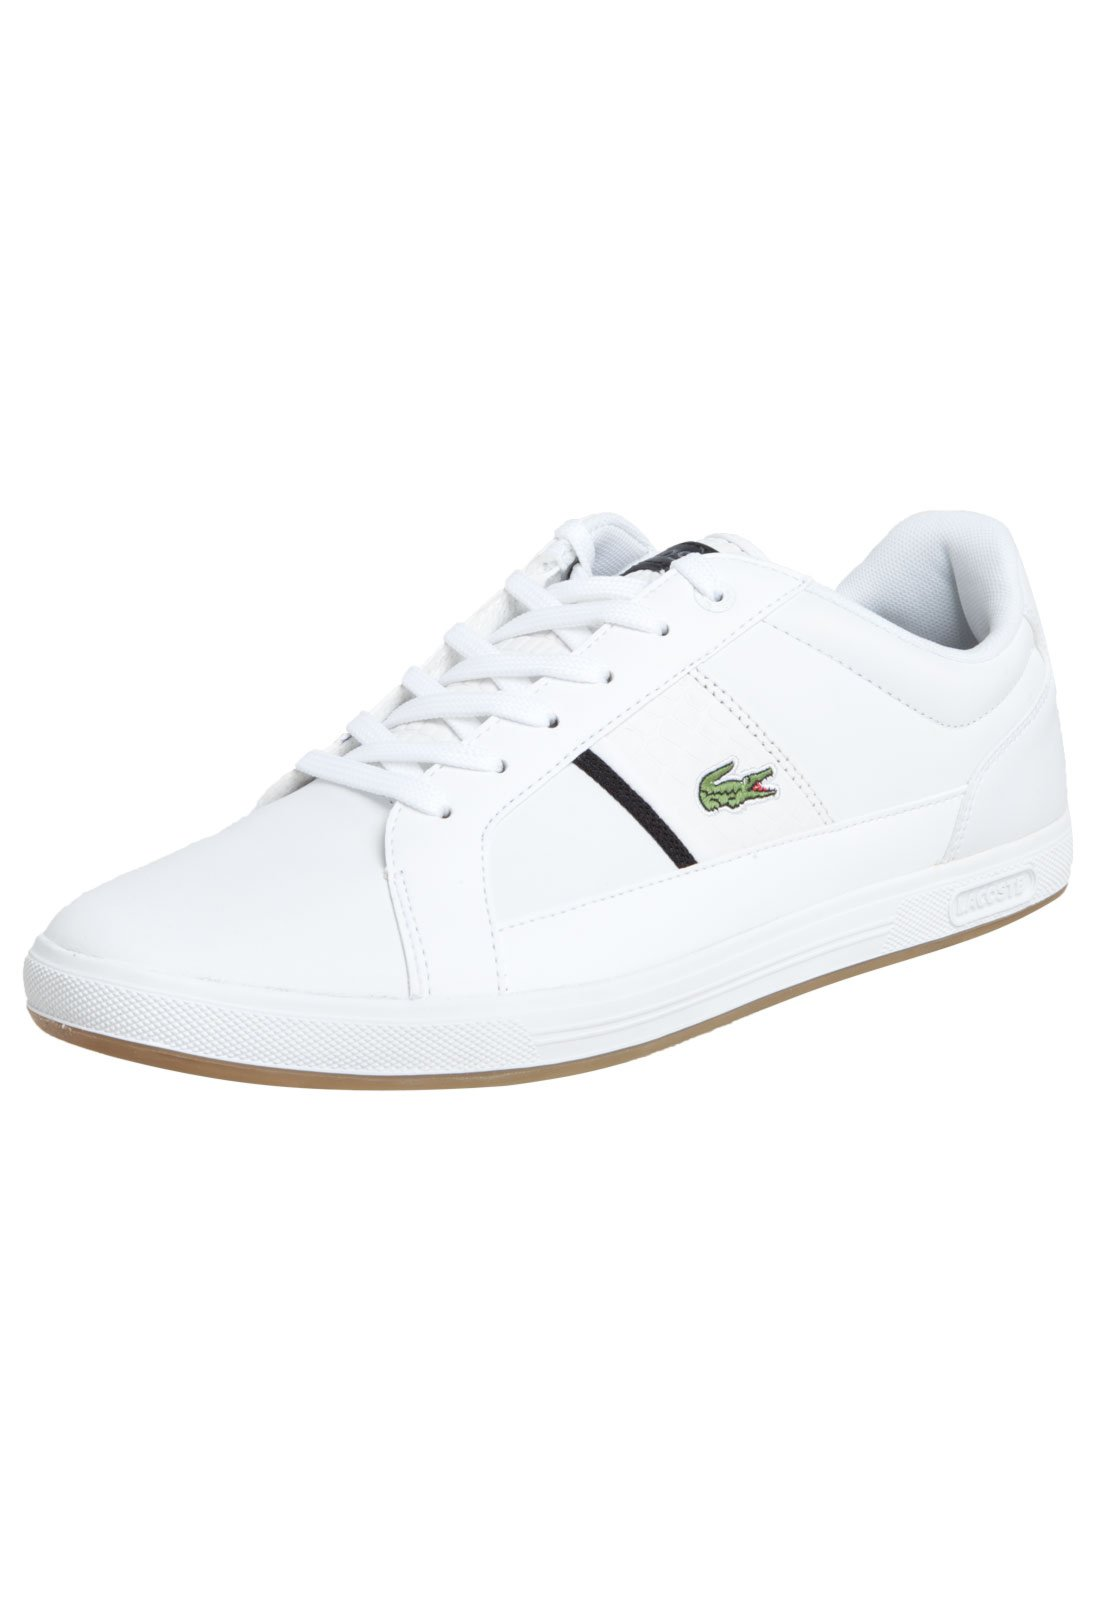 b452328c813a1 ... tenis lacoste branco feminino ...